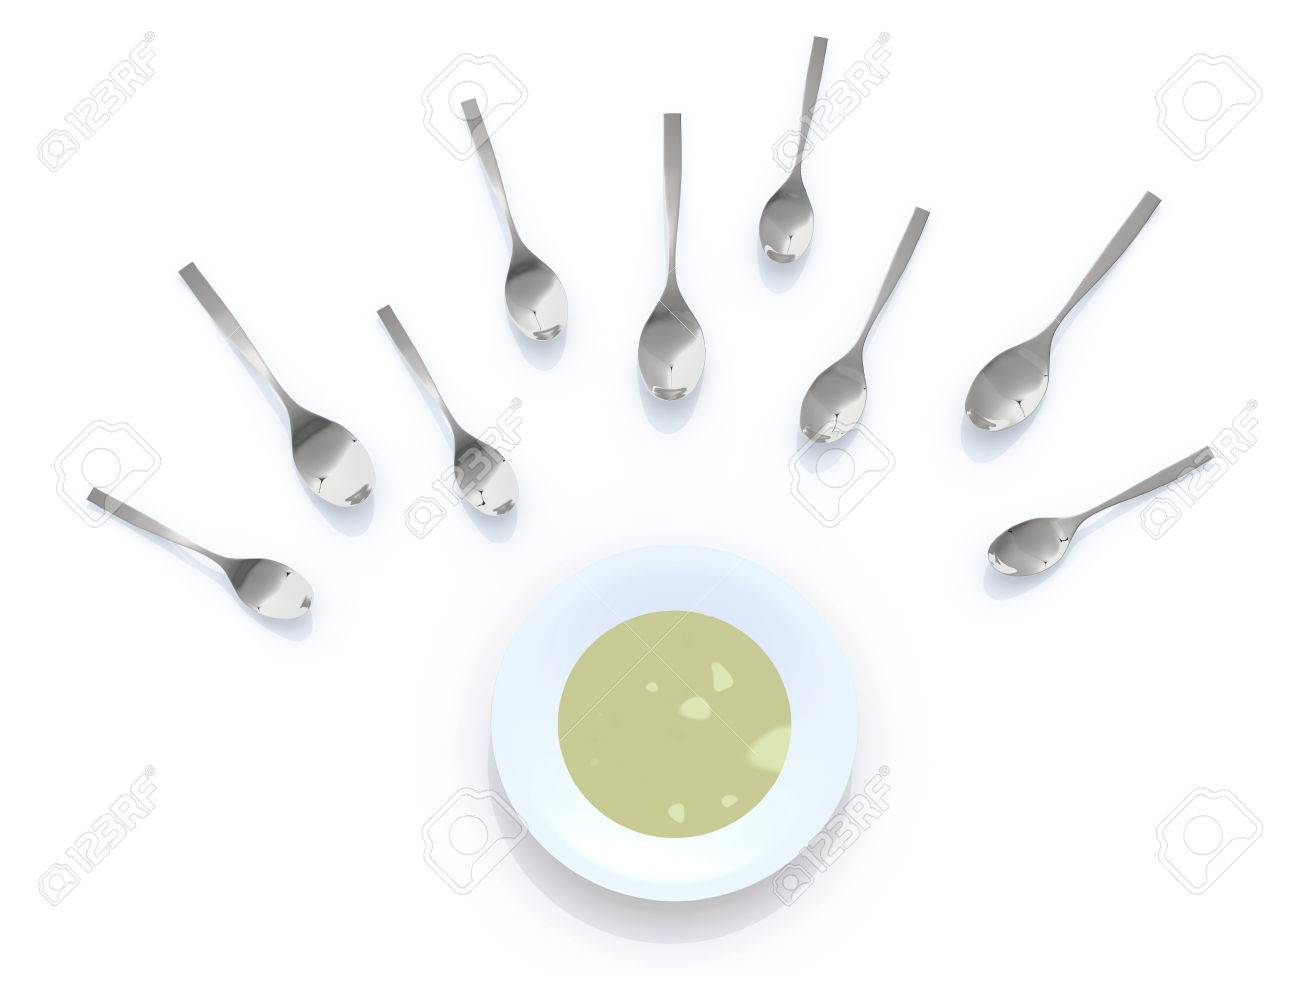 Sperma löffel